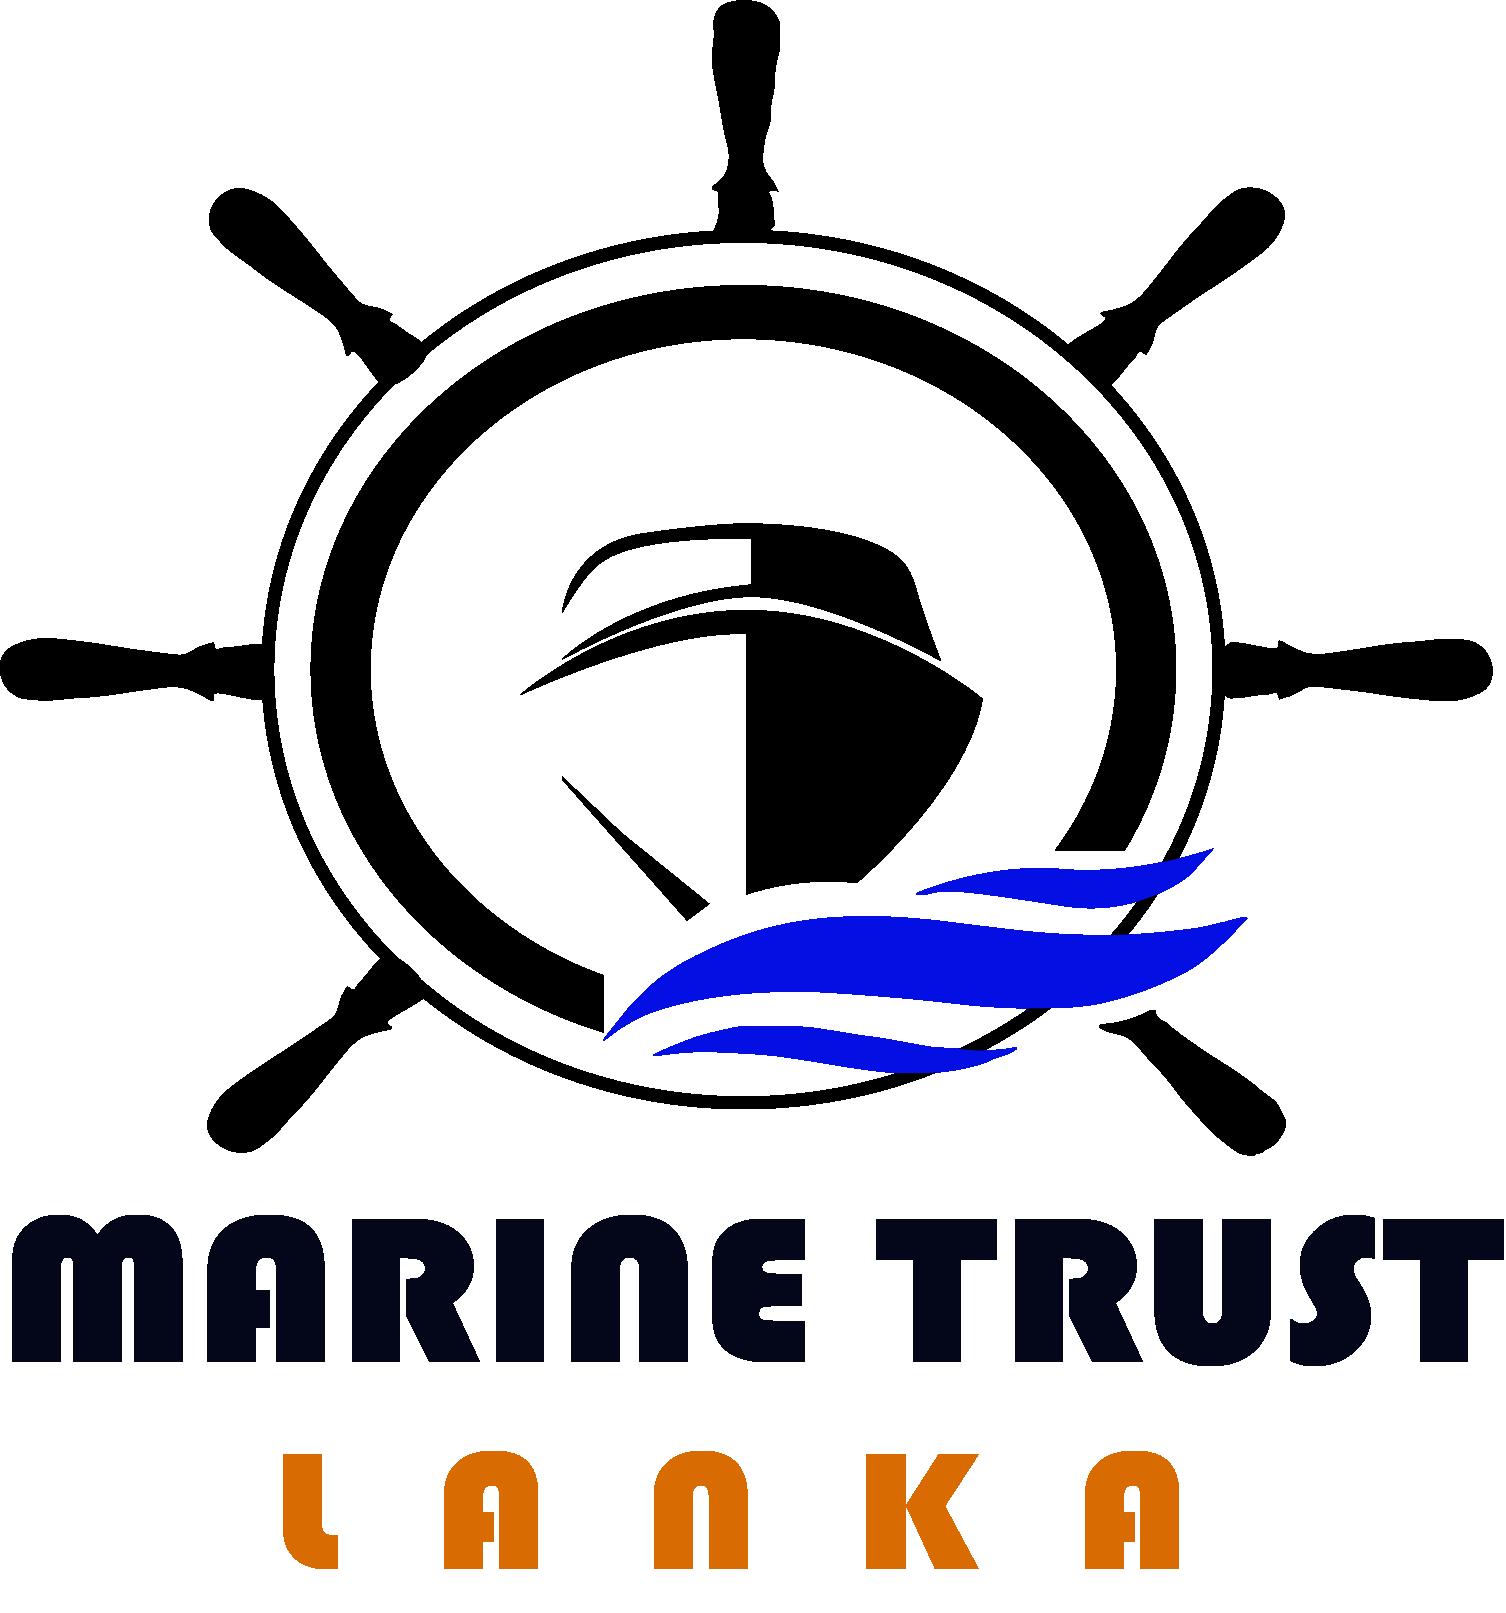 Marine trust lanka Logo